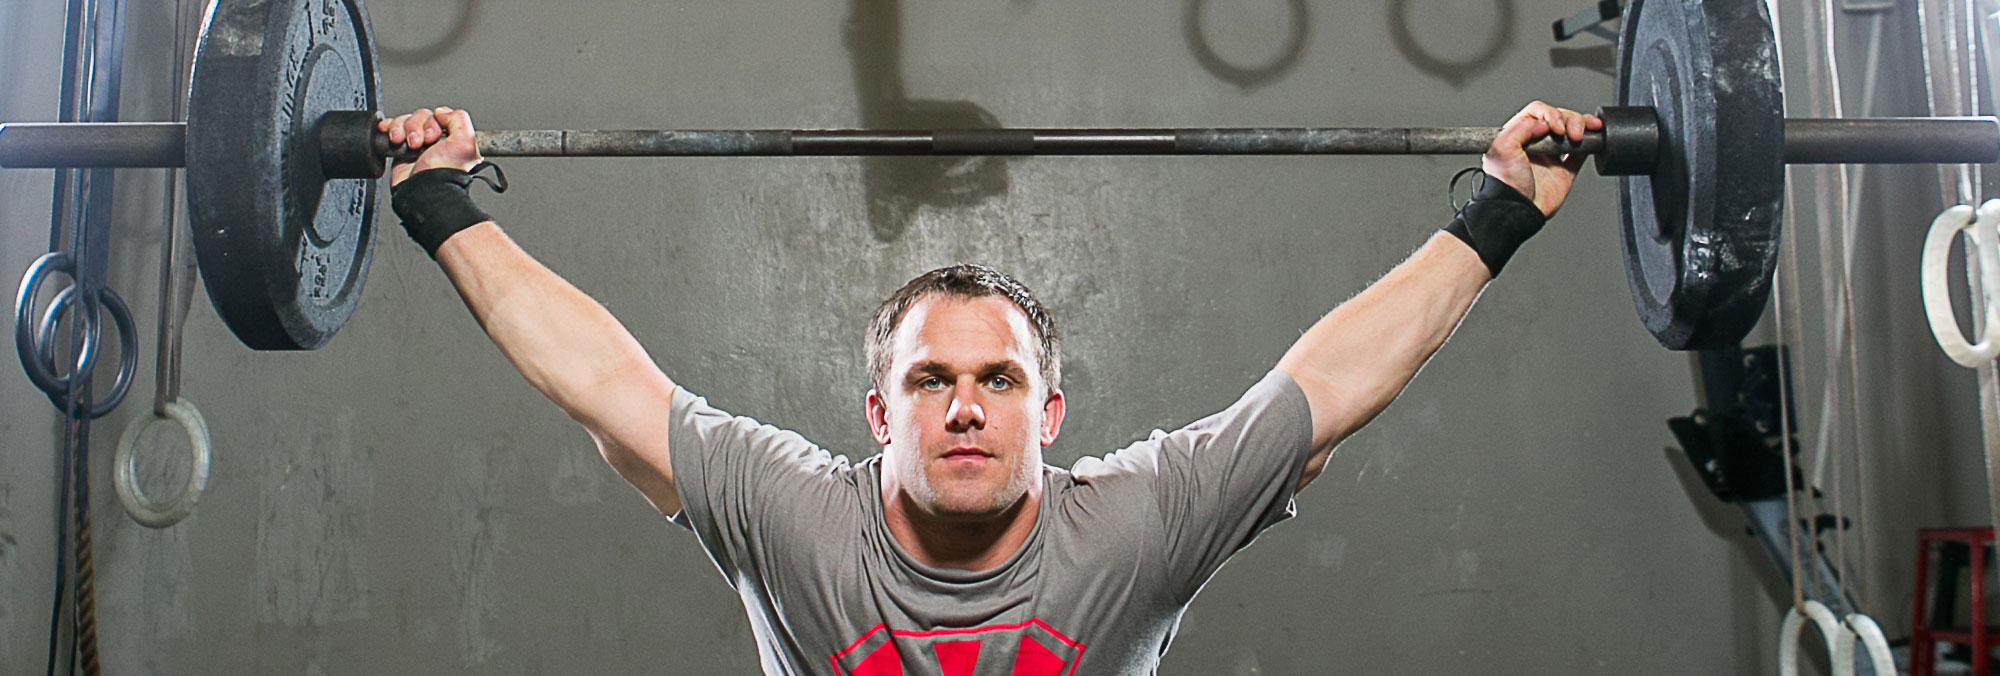 San Diego's Best Crossfit Training Gym